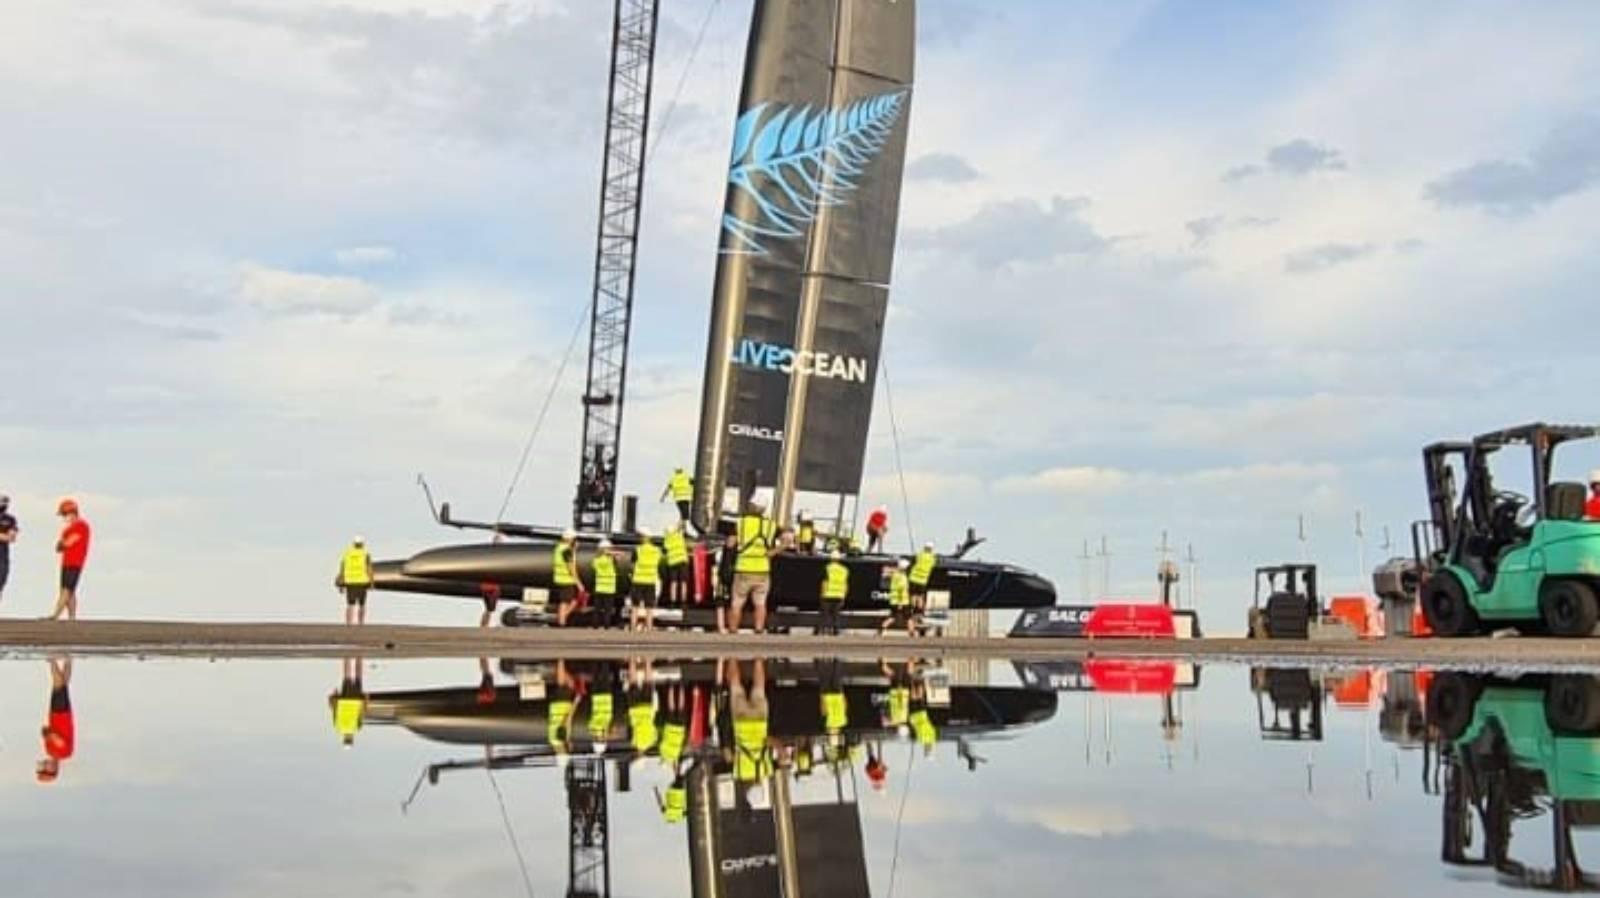 Burling and Tuke christen New Zealand's SailGP boat